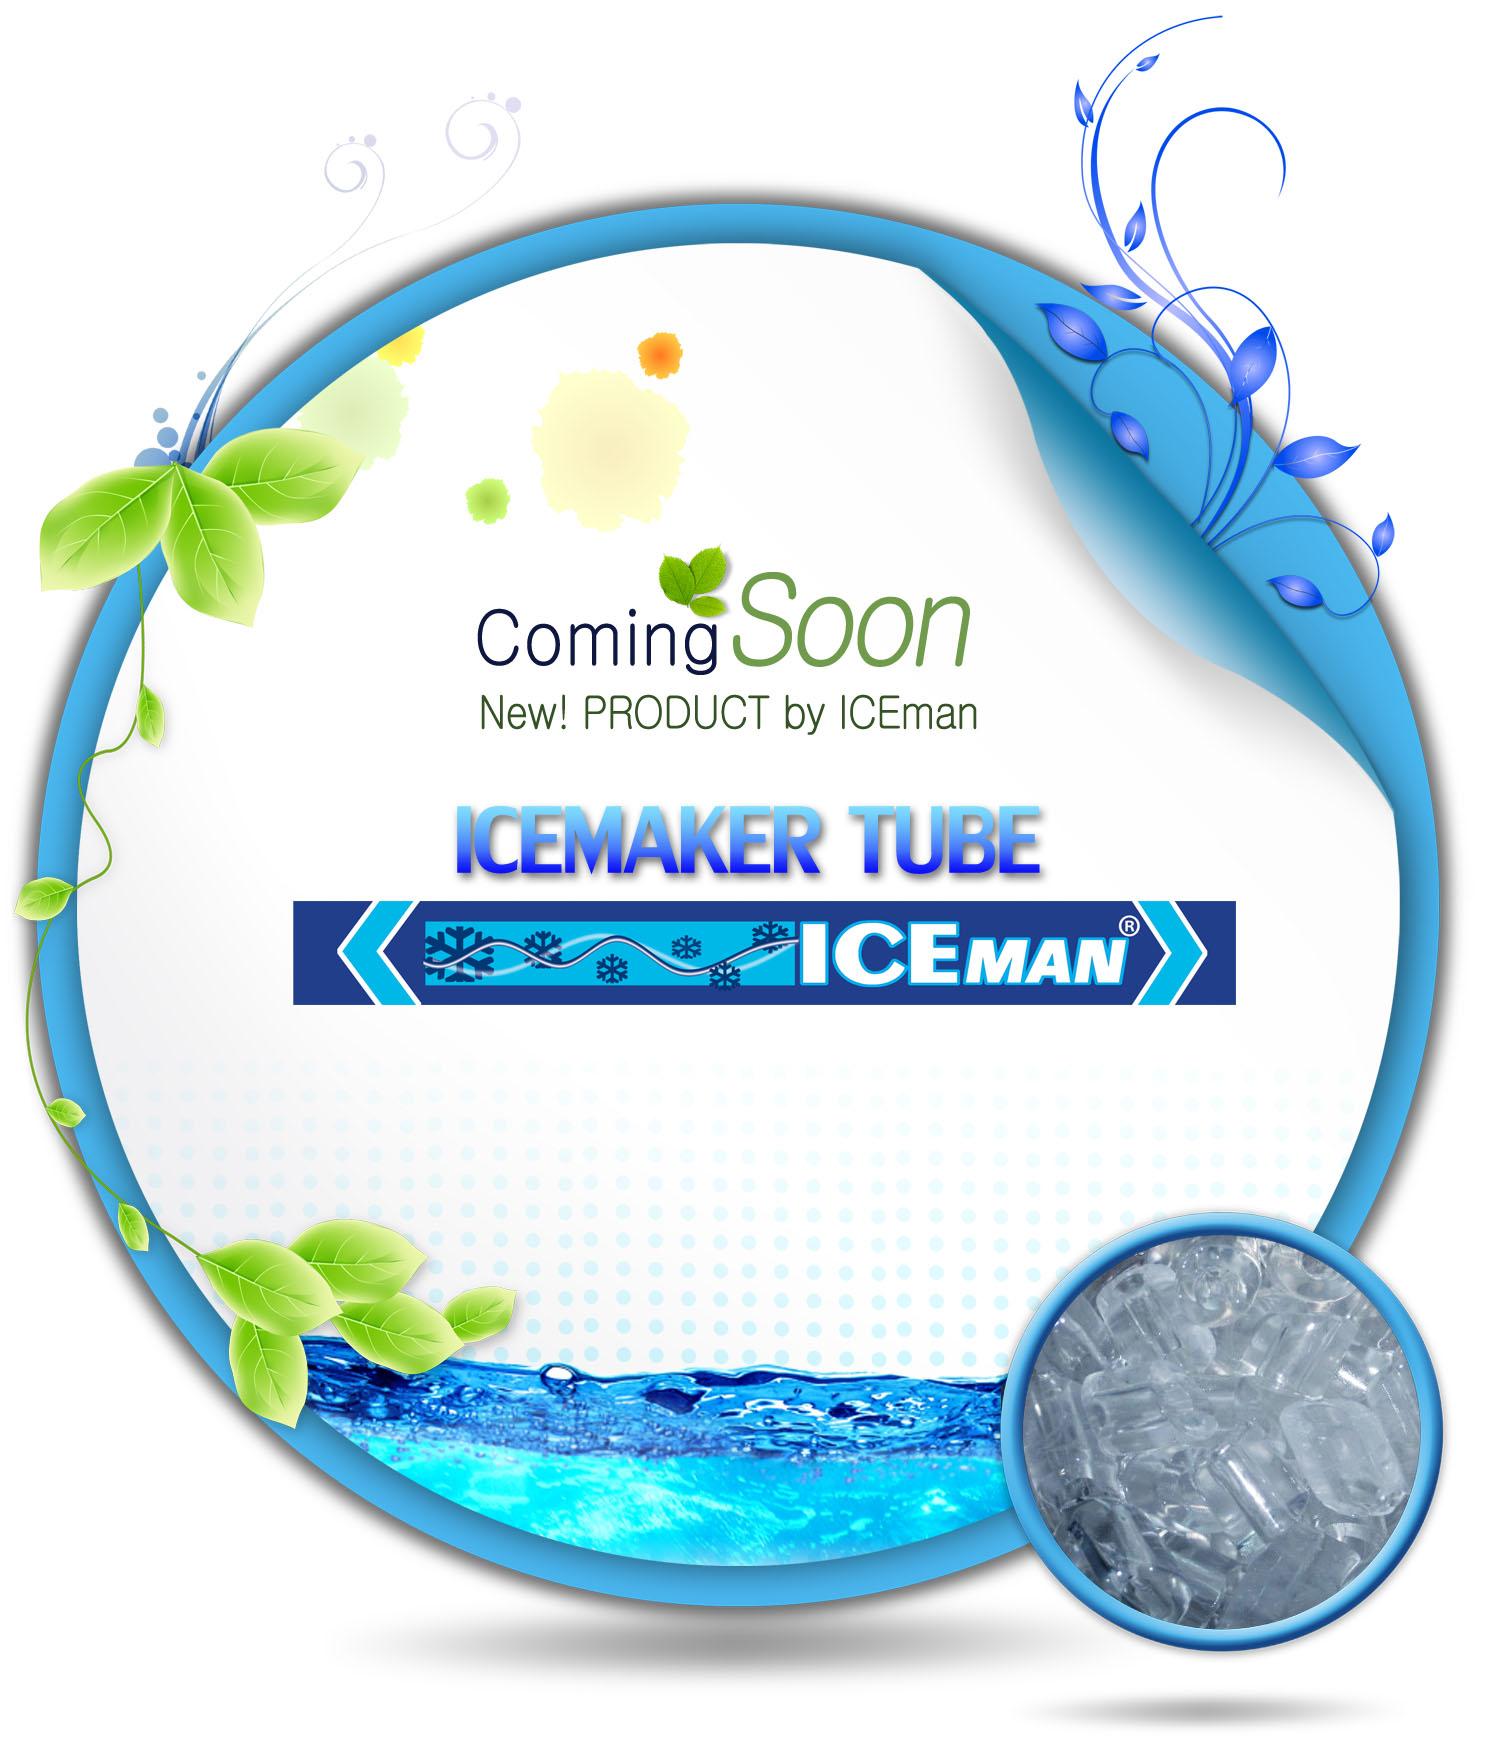 comsoon tube